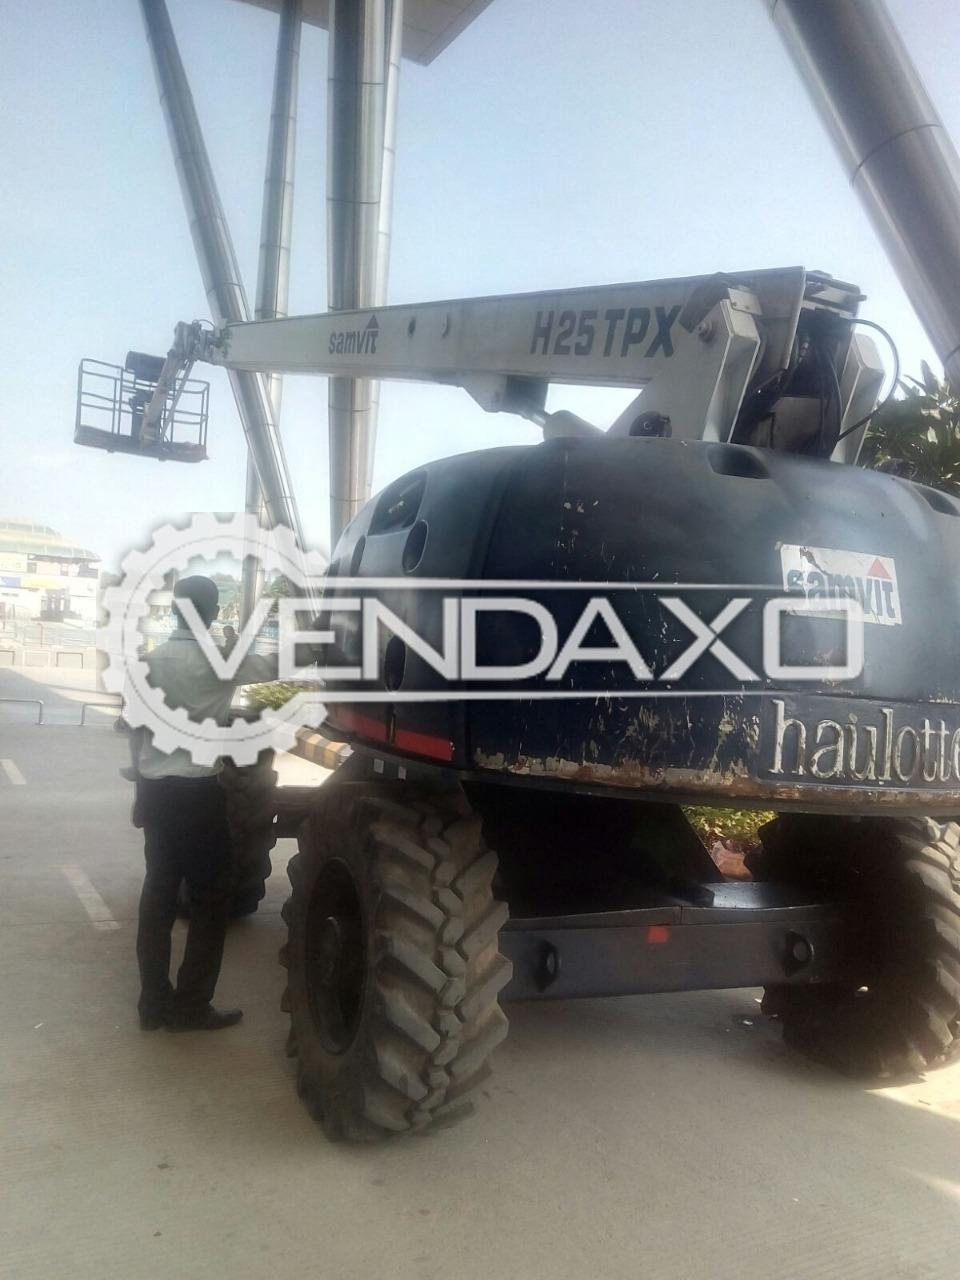 Haulotte H25 TPX Boom Lifts